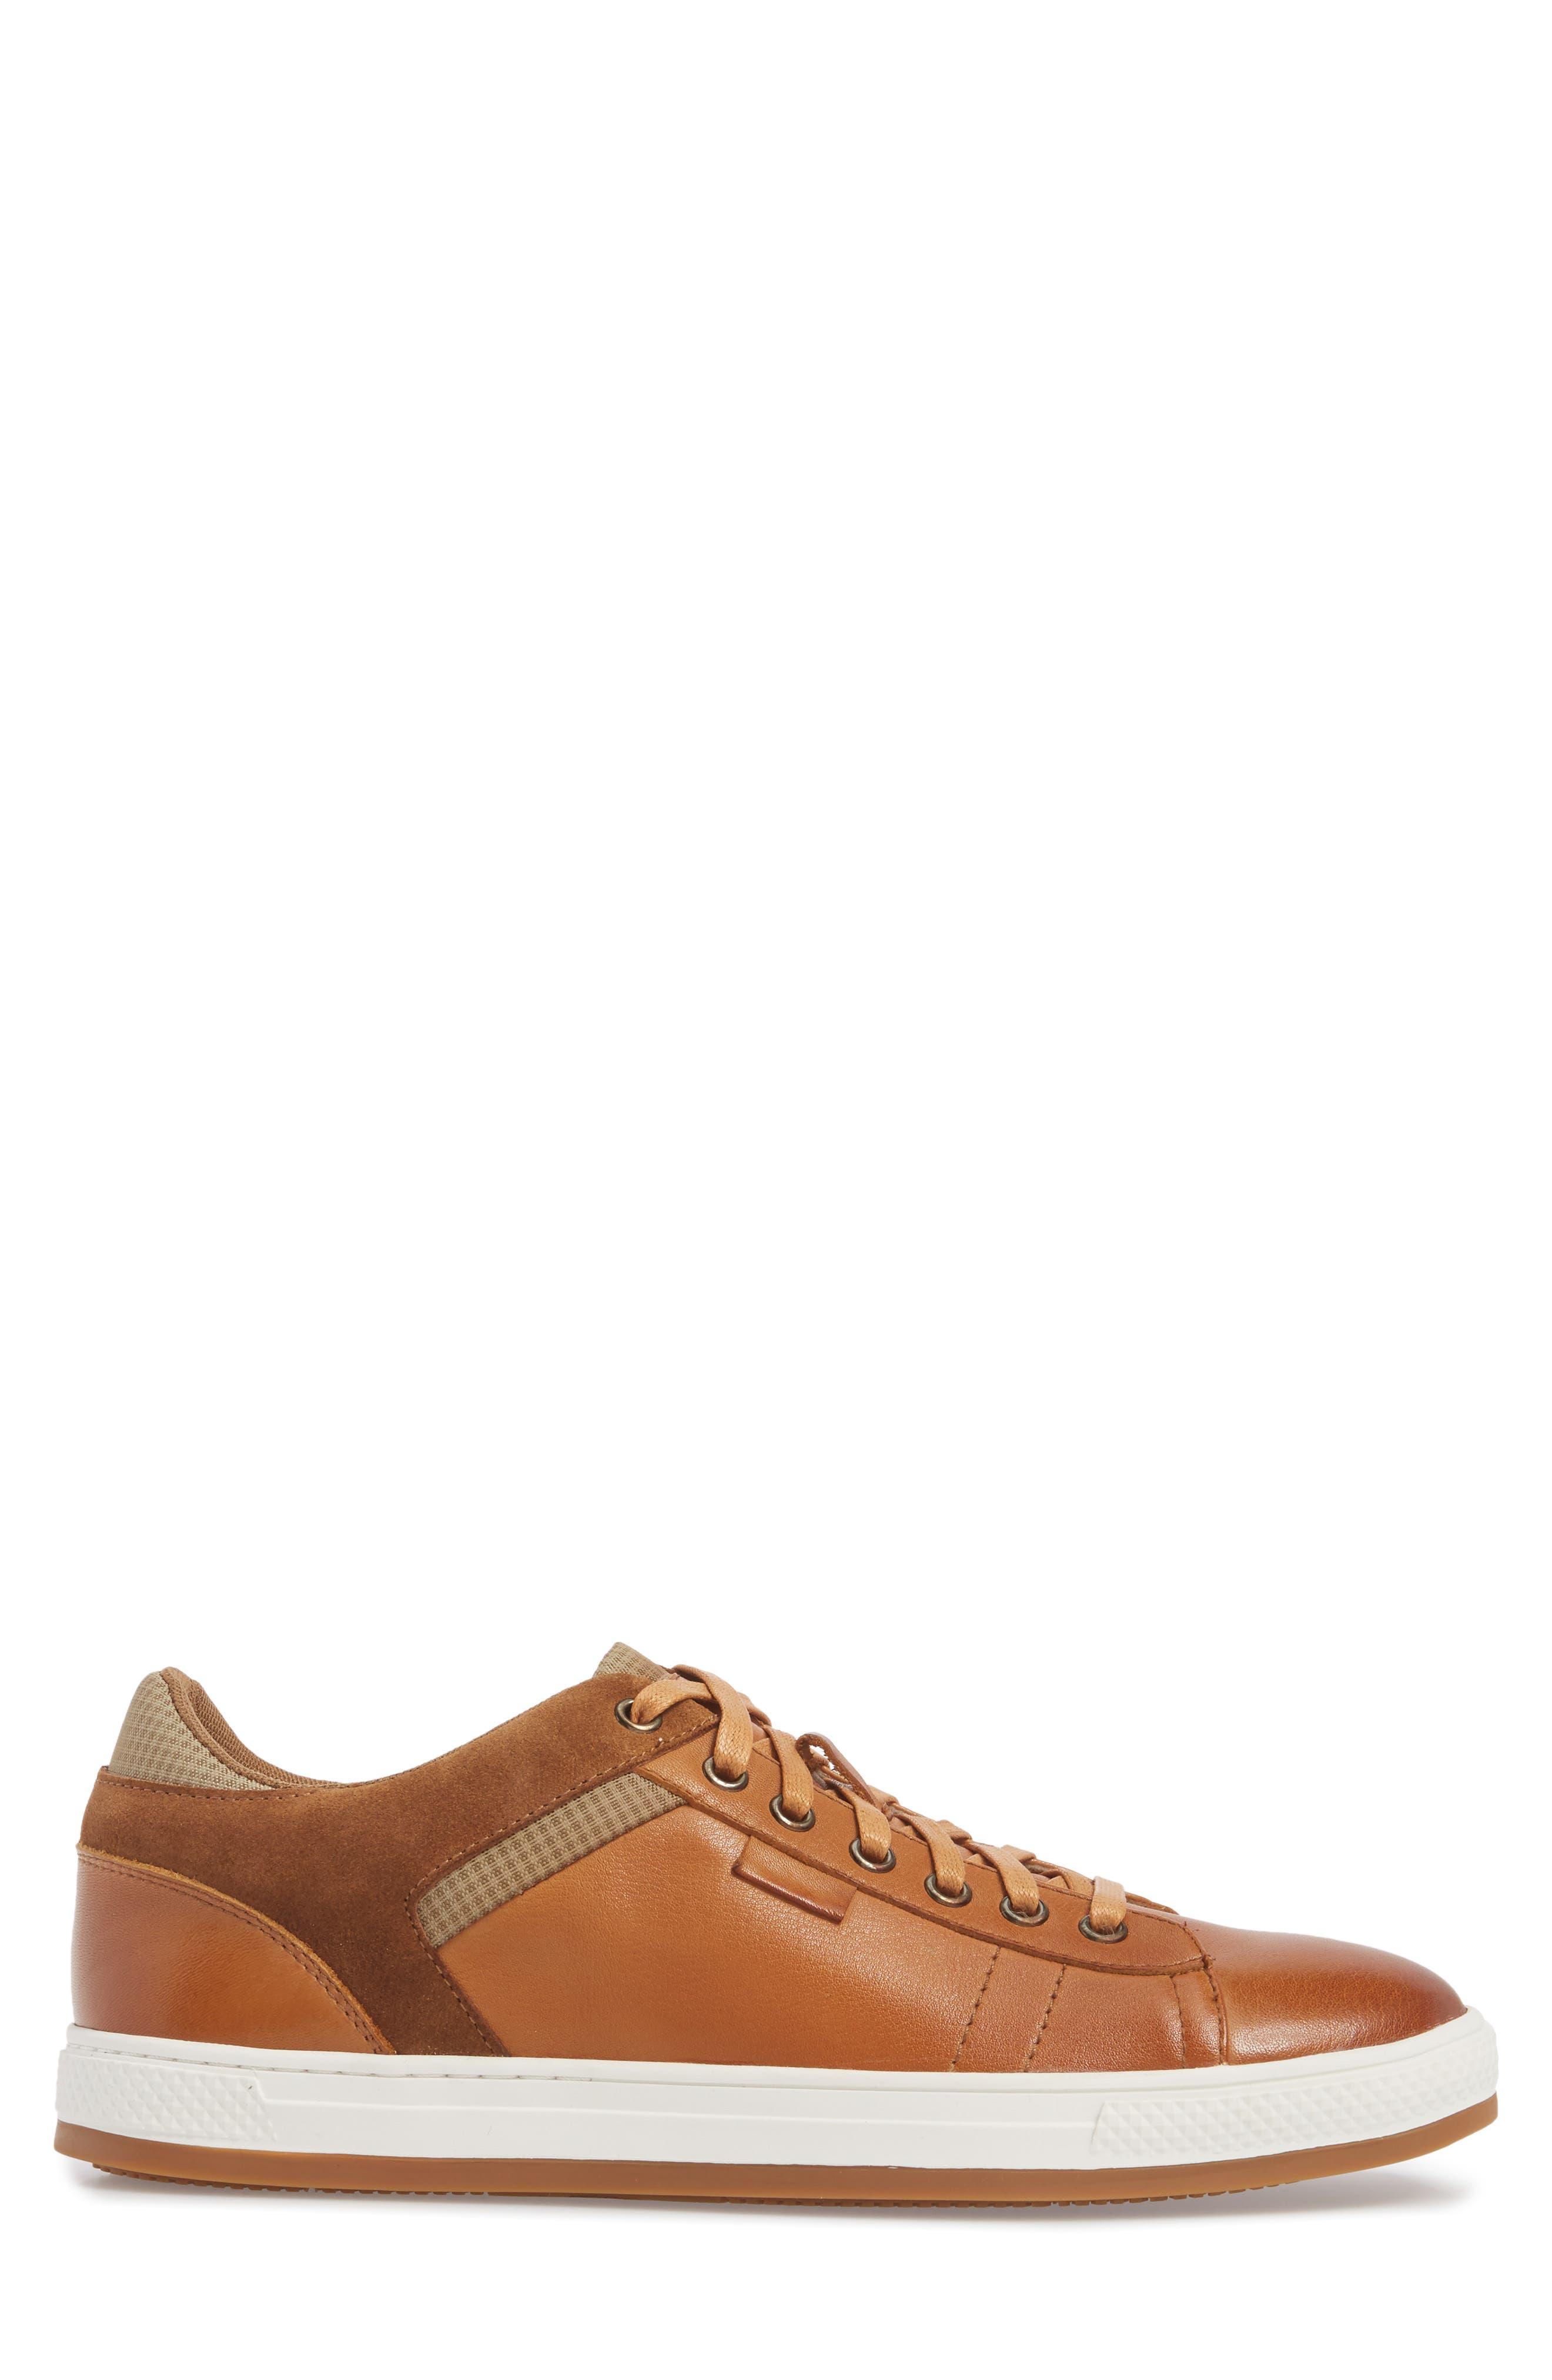 Ireton Low Top Sneaker,                             Alternate thumbnail 3, color,                             Cognac Leather/ Suede